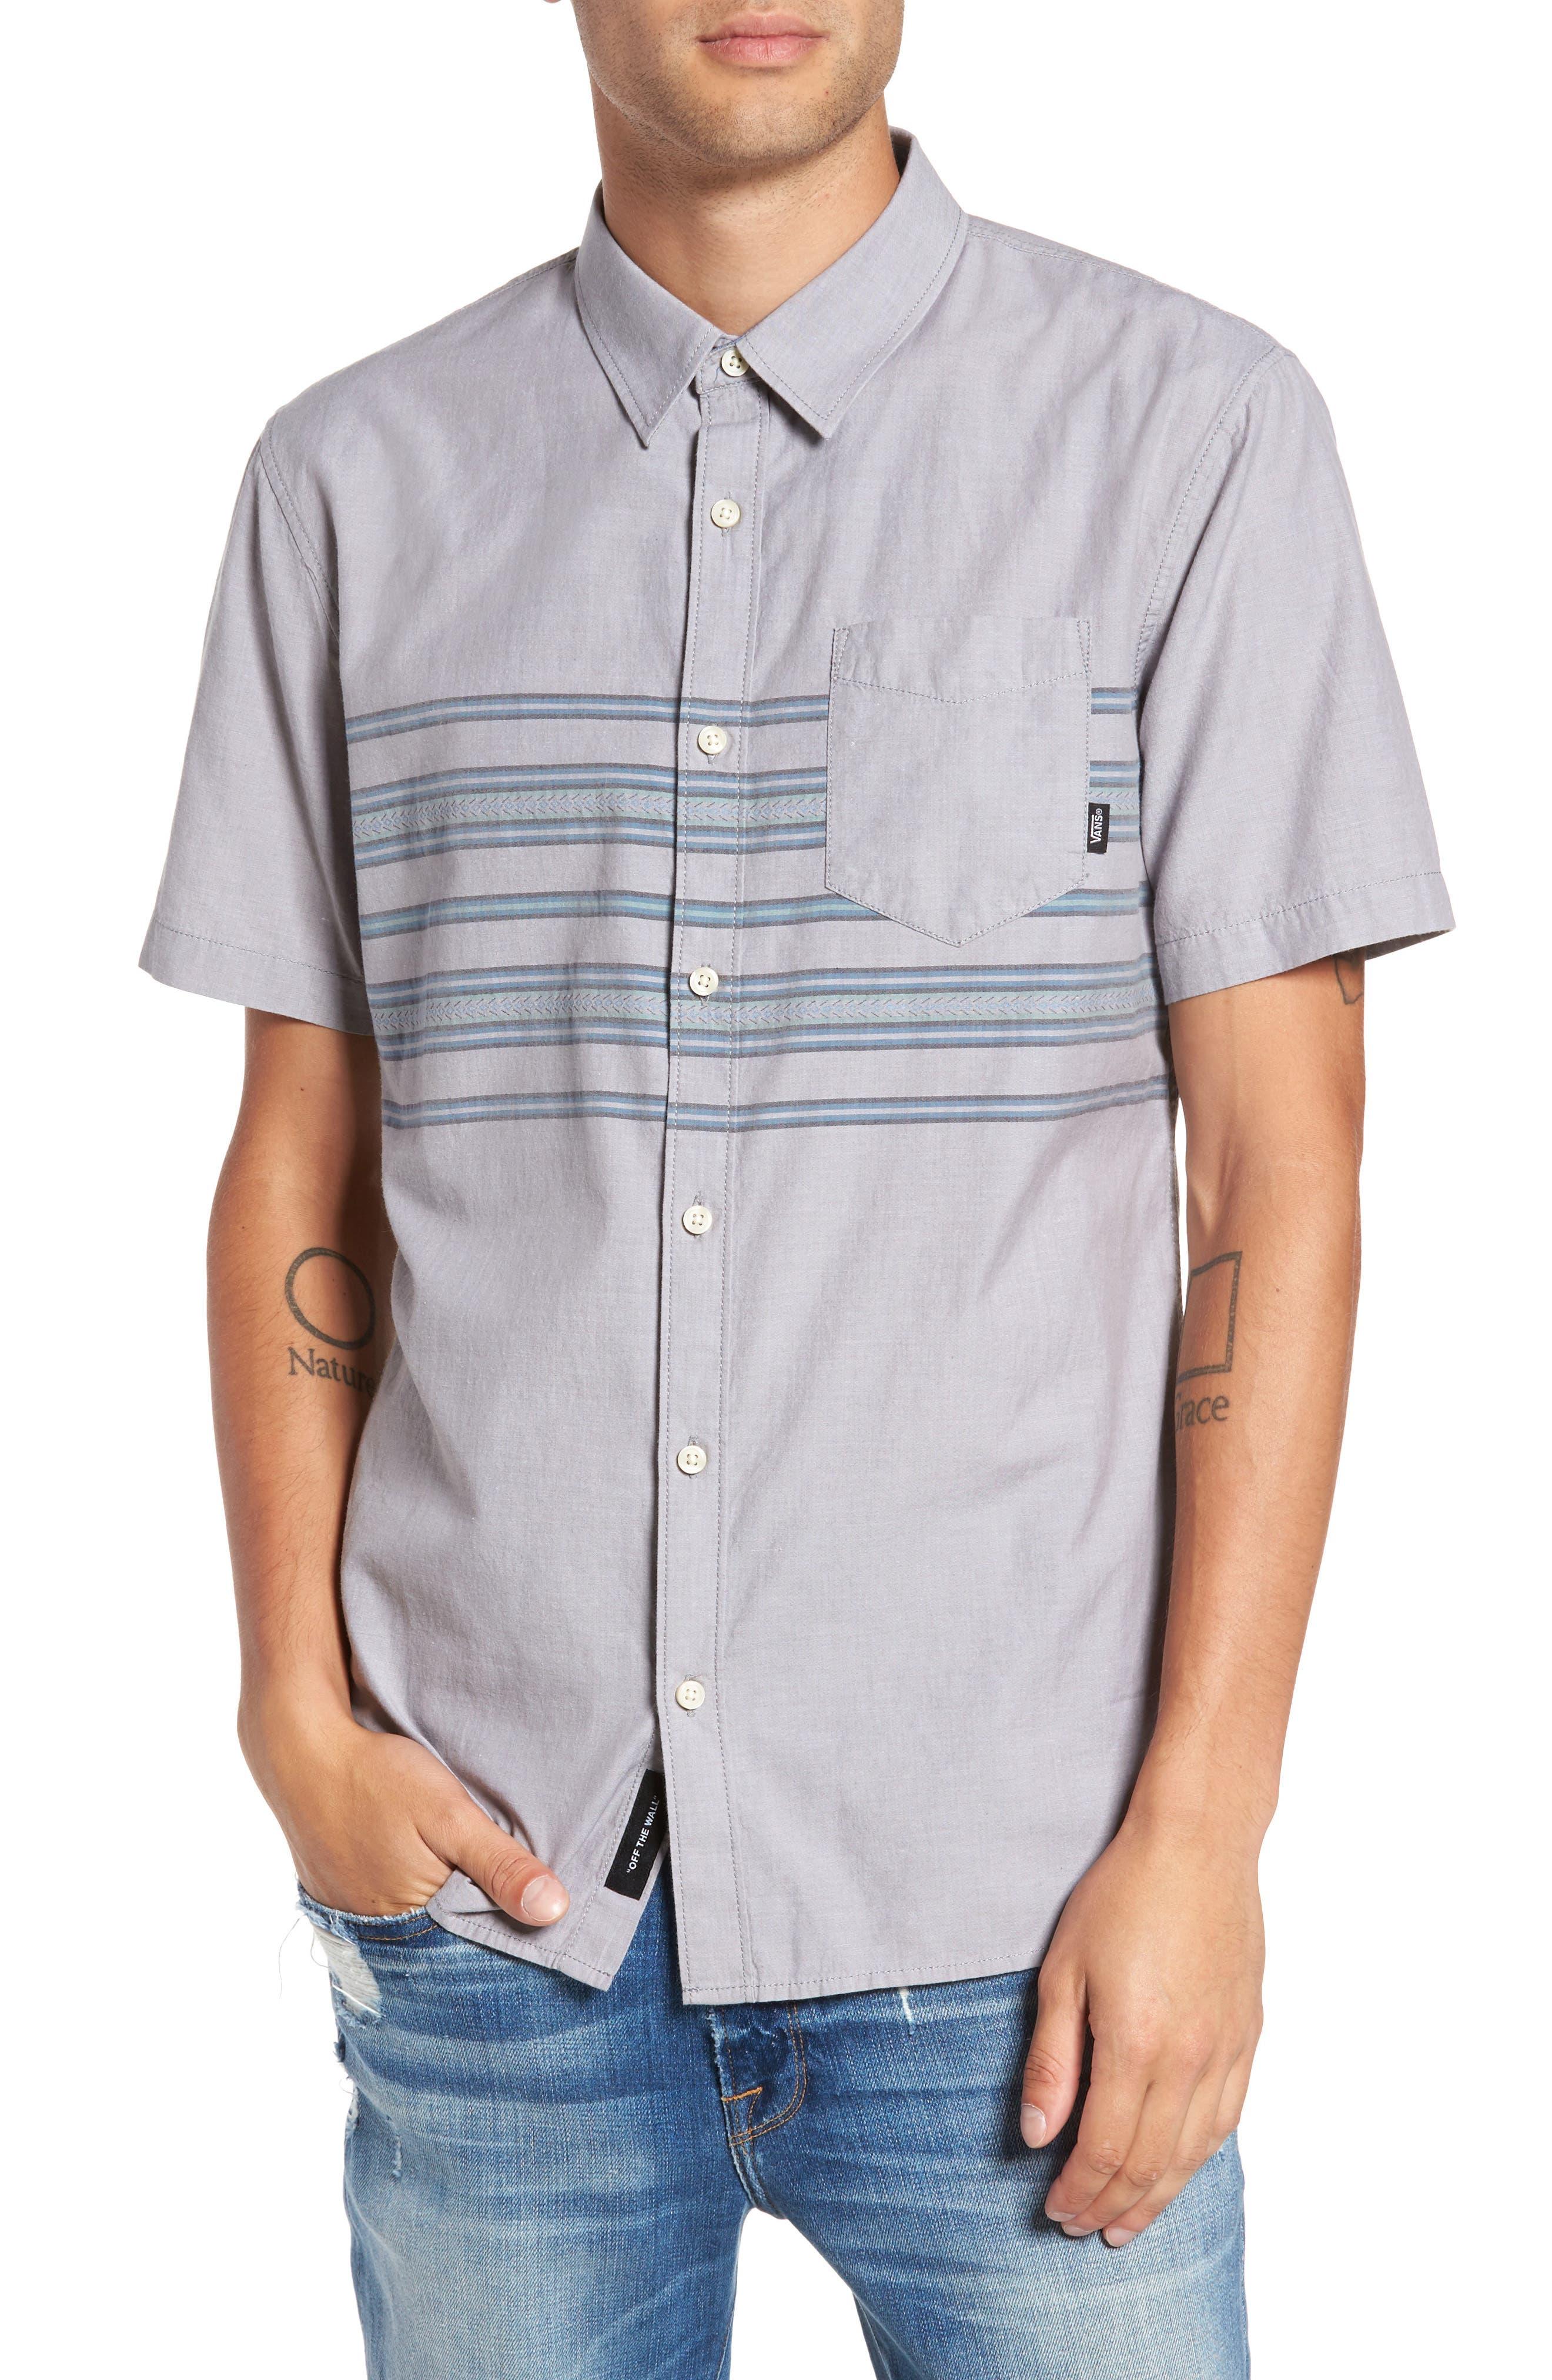 Benmore Striped Woven Shirt,                         Main,                         color, 021